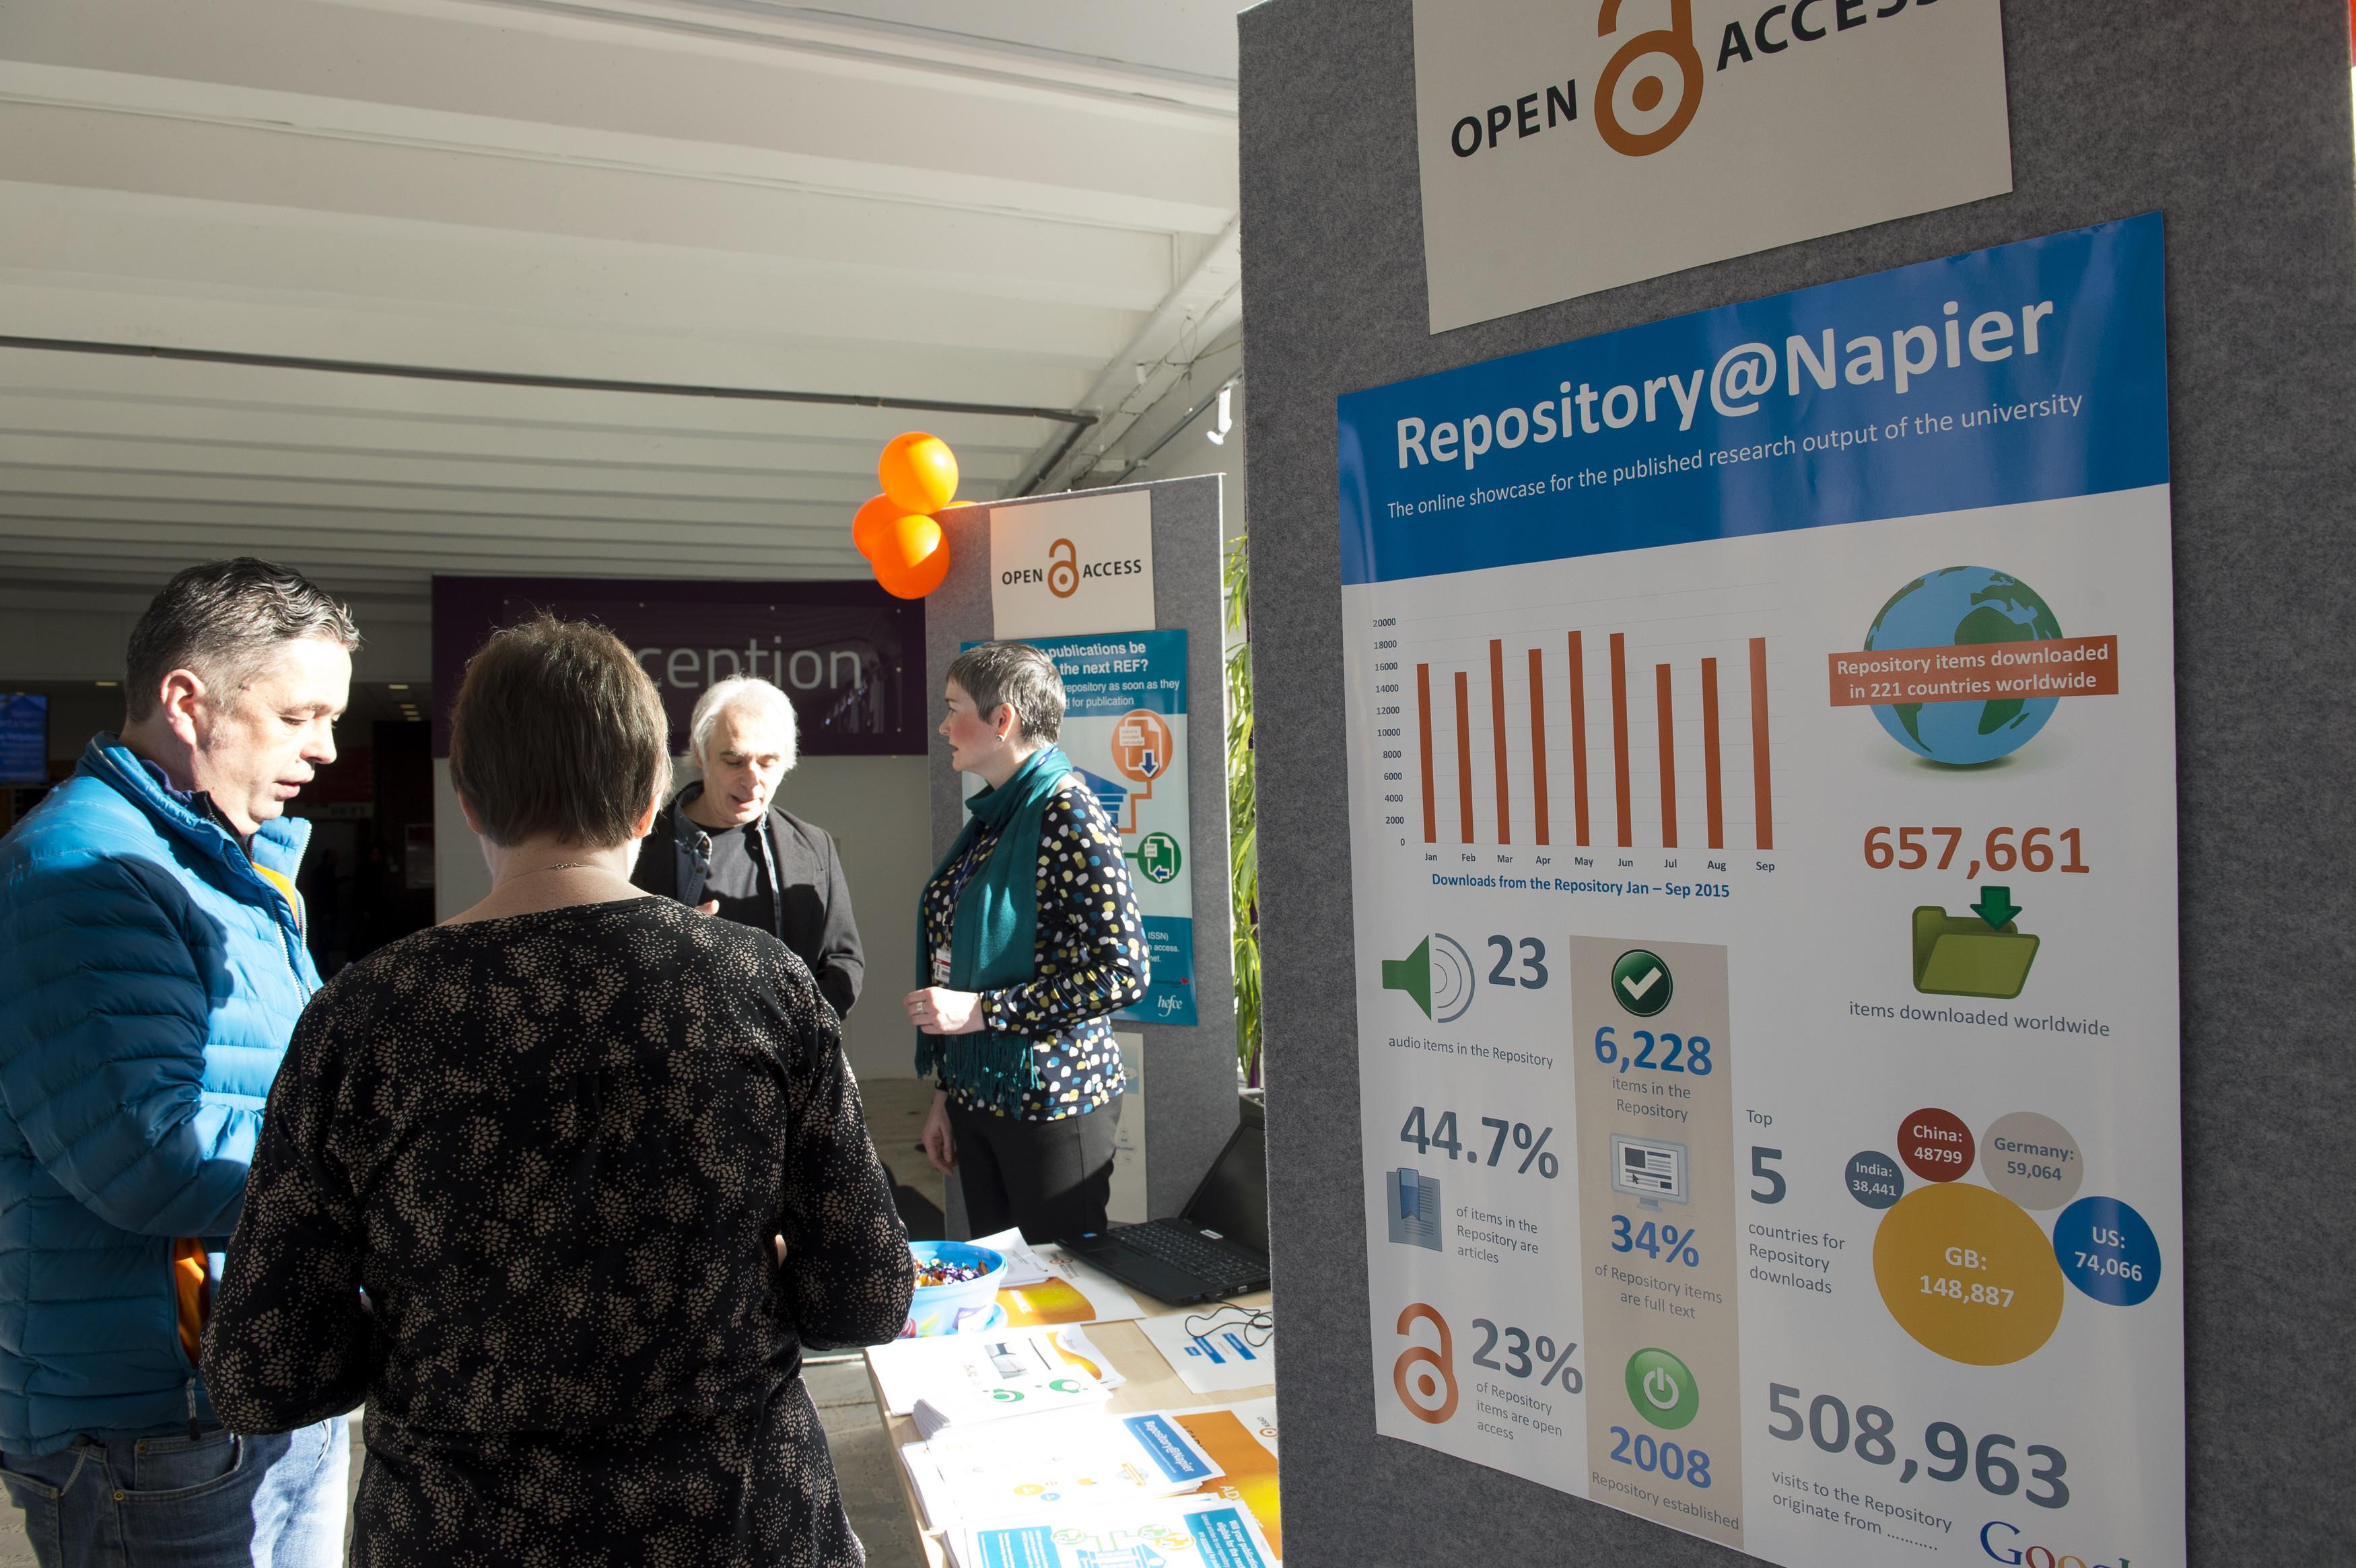 Open Access Week 2015 at Edinburgh Napier University